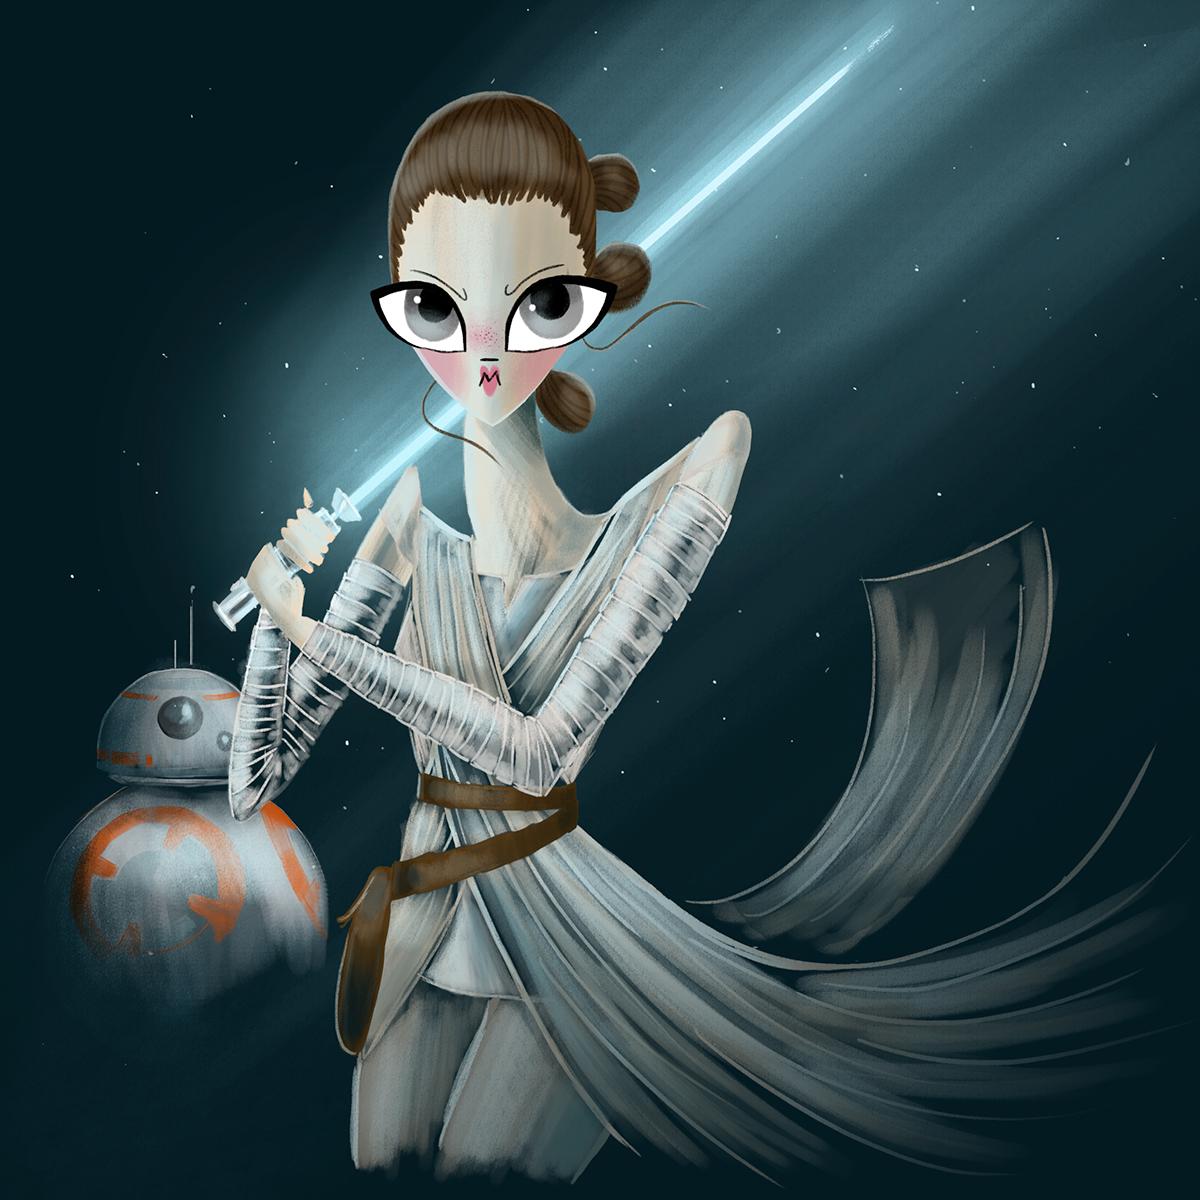 star wars rey Mad Max Furiosa marie antoinette sailor moon Hunger Games Katniss fan art fanart